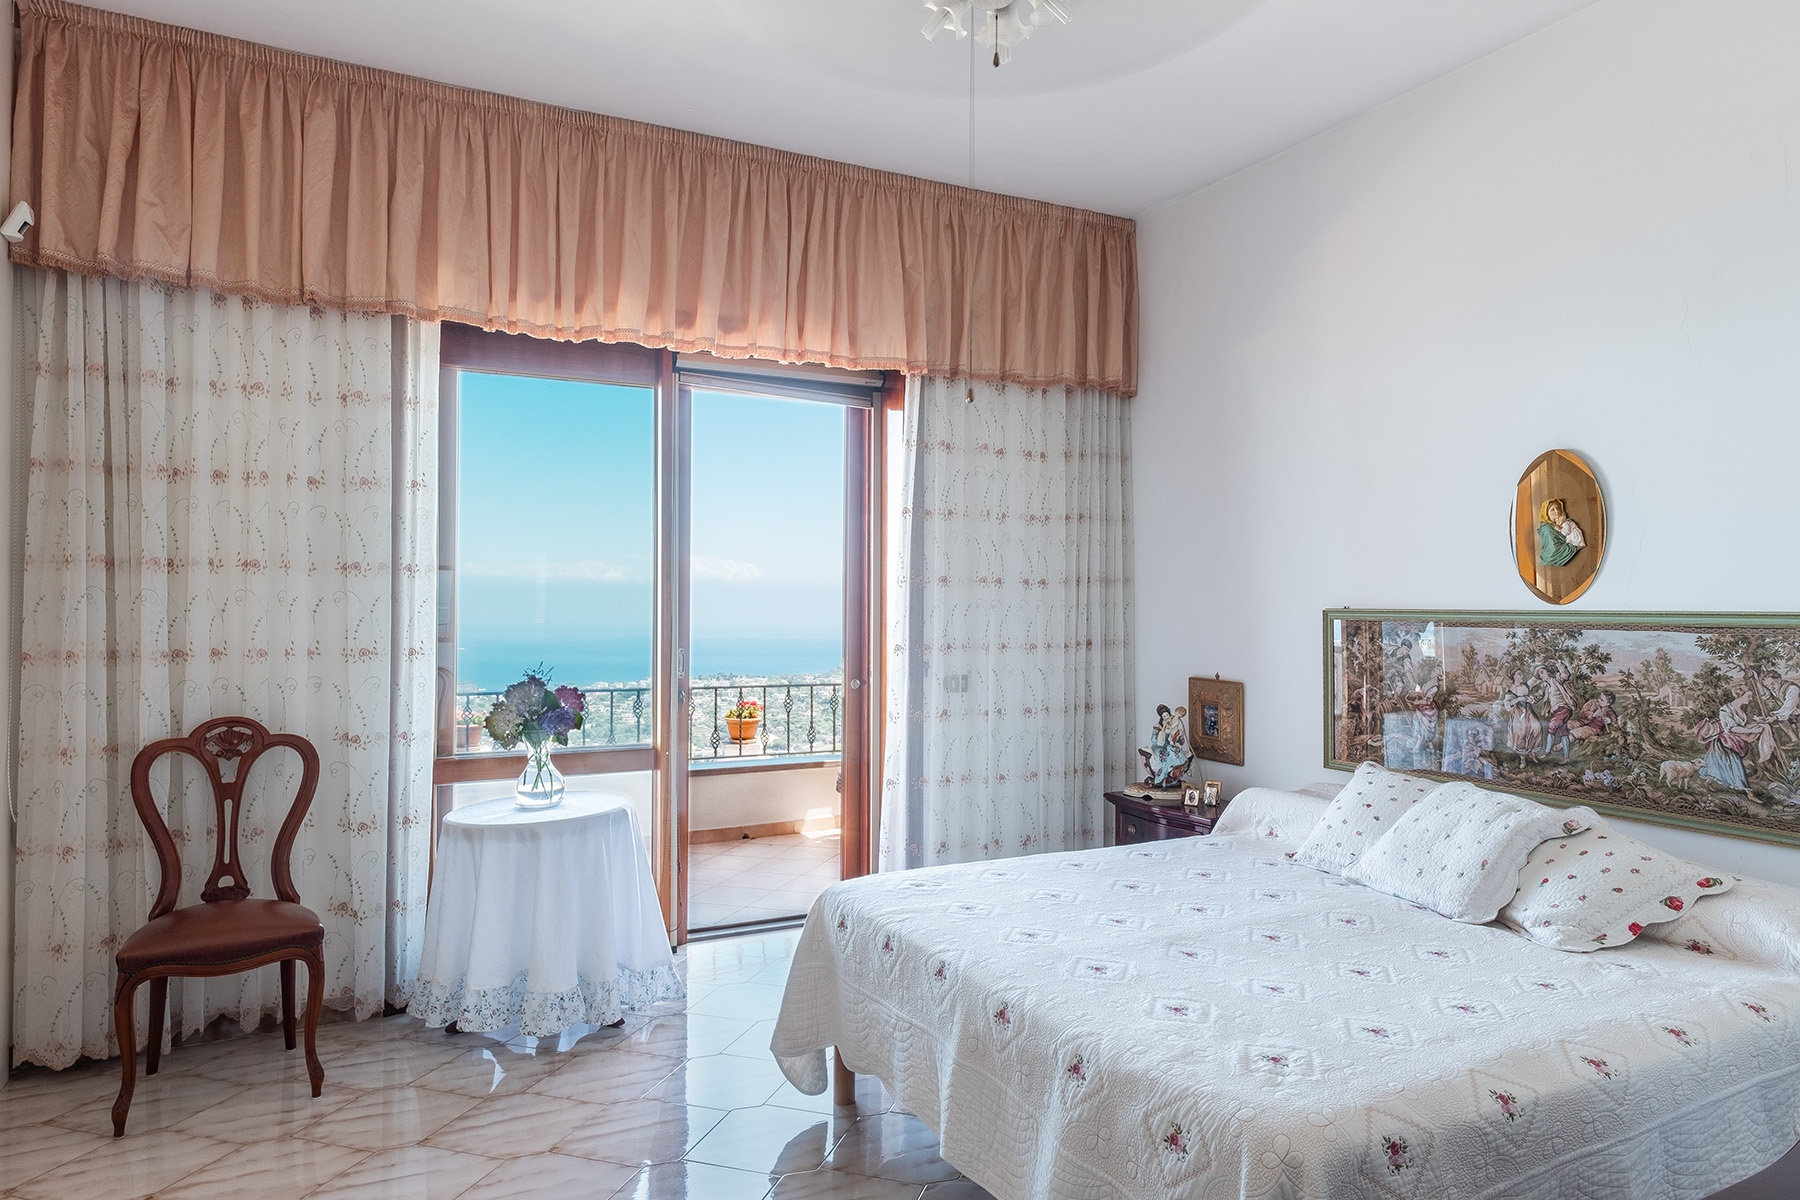 Villa in Vendita a Ischia: 5 locali, 138 mq - Foto 17